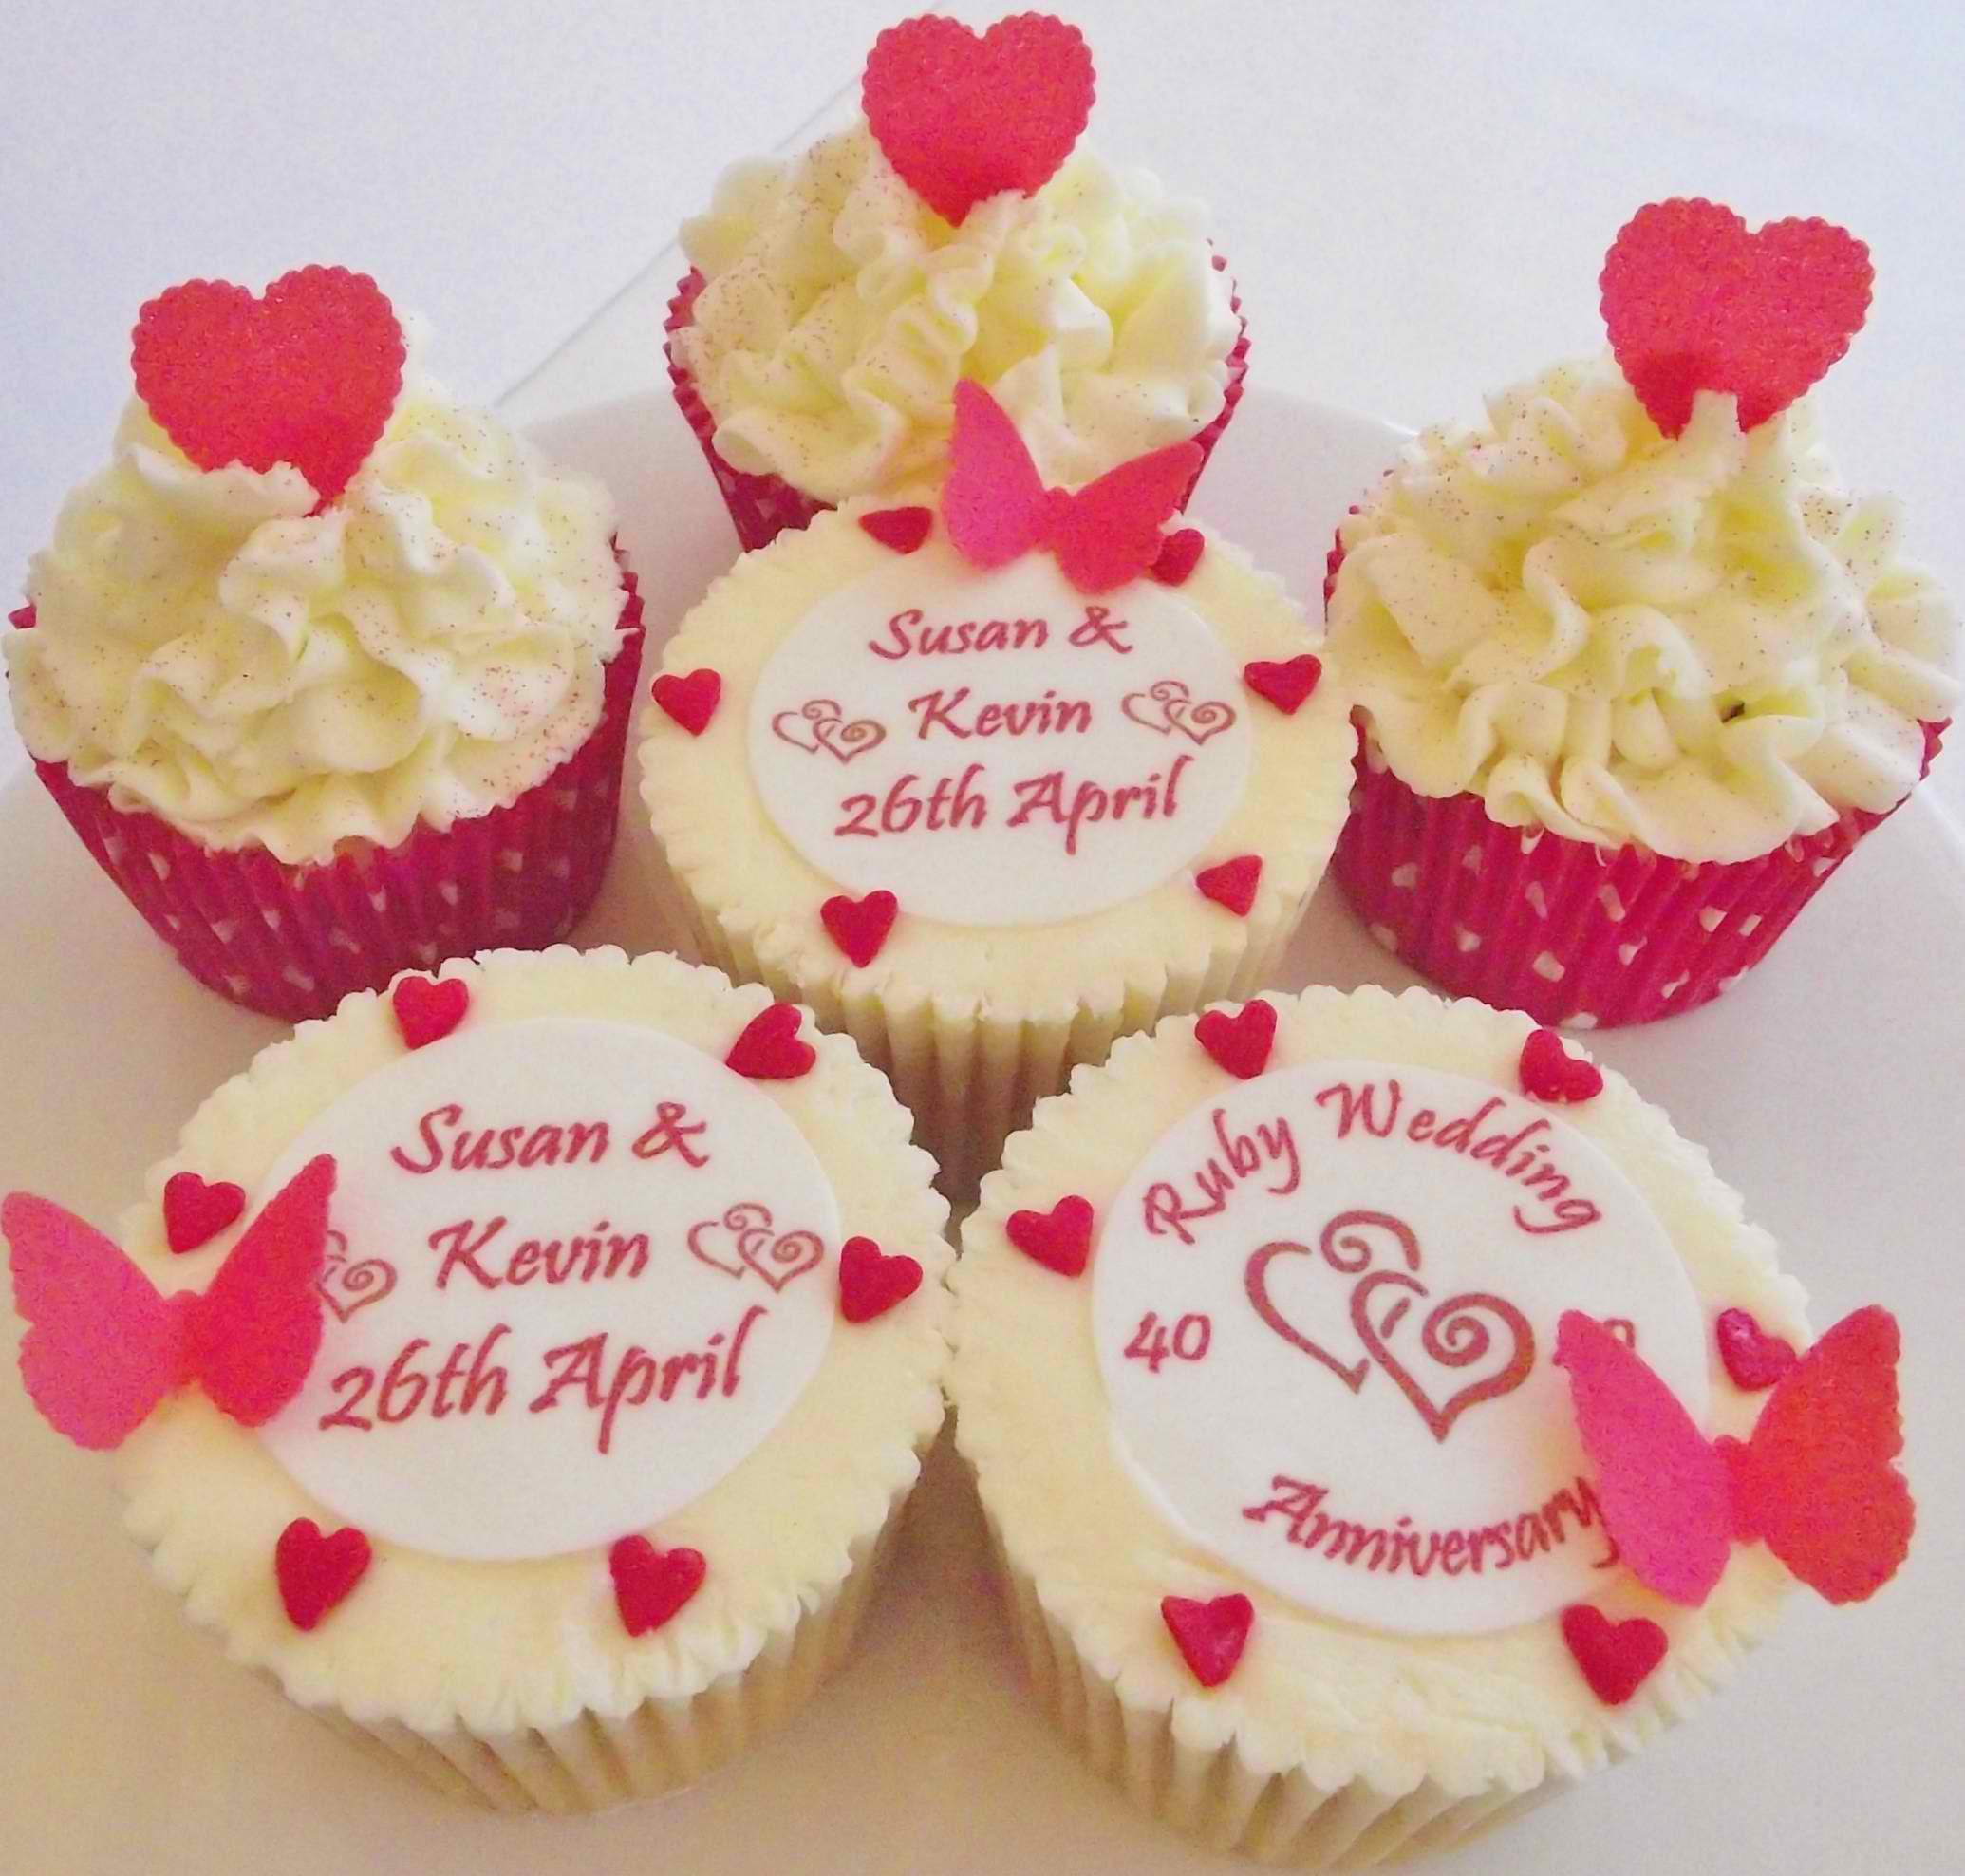 Wedding Anniversary Cupcakes Ideas  30 Amazing Anniversary Cupcakes